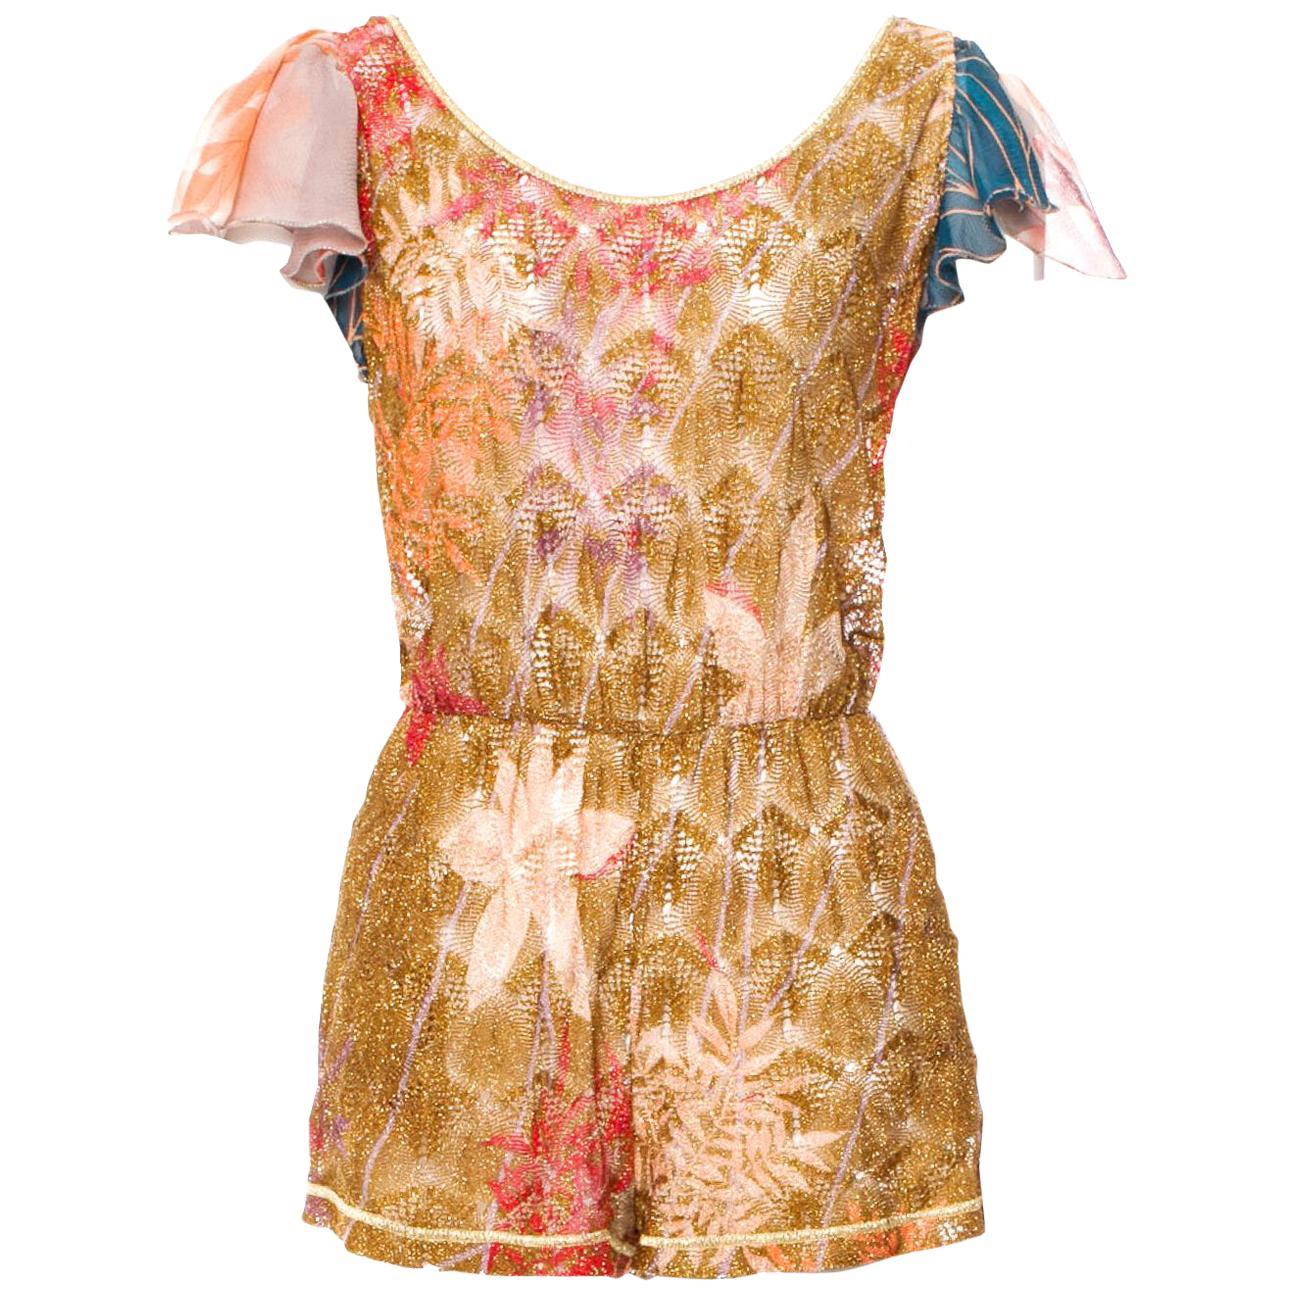 Missoni Gold Metallic Crochet Knit Floral Print Mini Jumpsuit Romper Playsuit